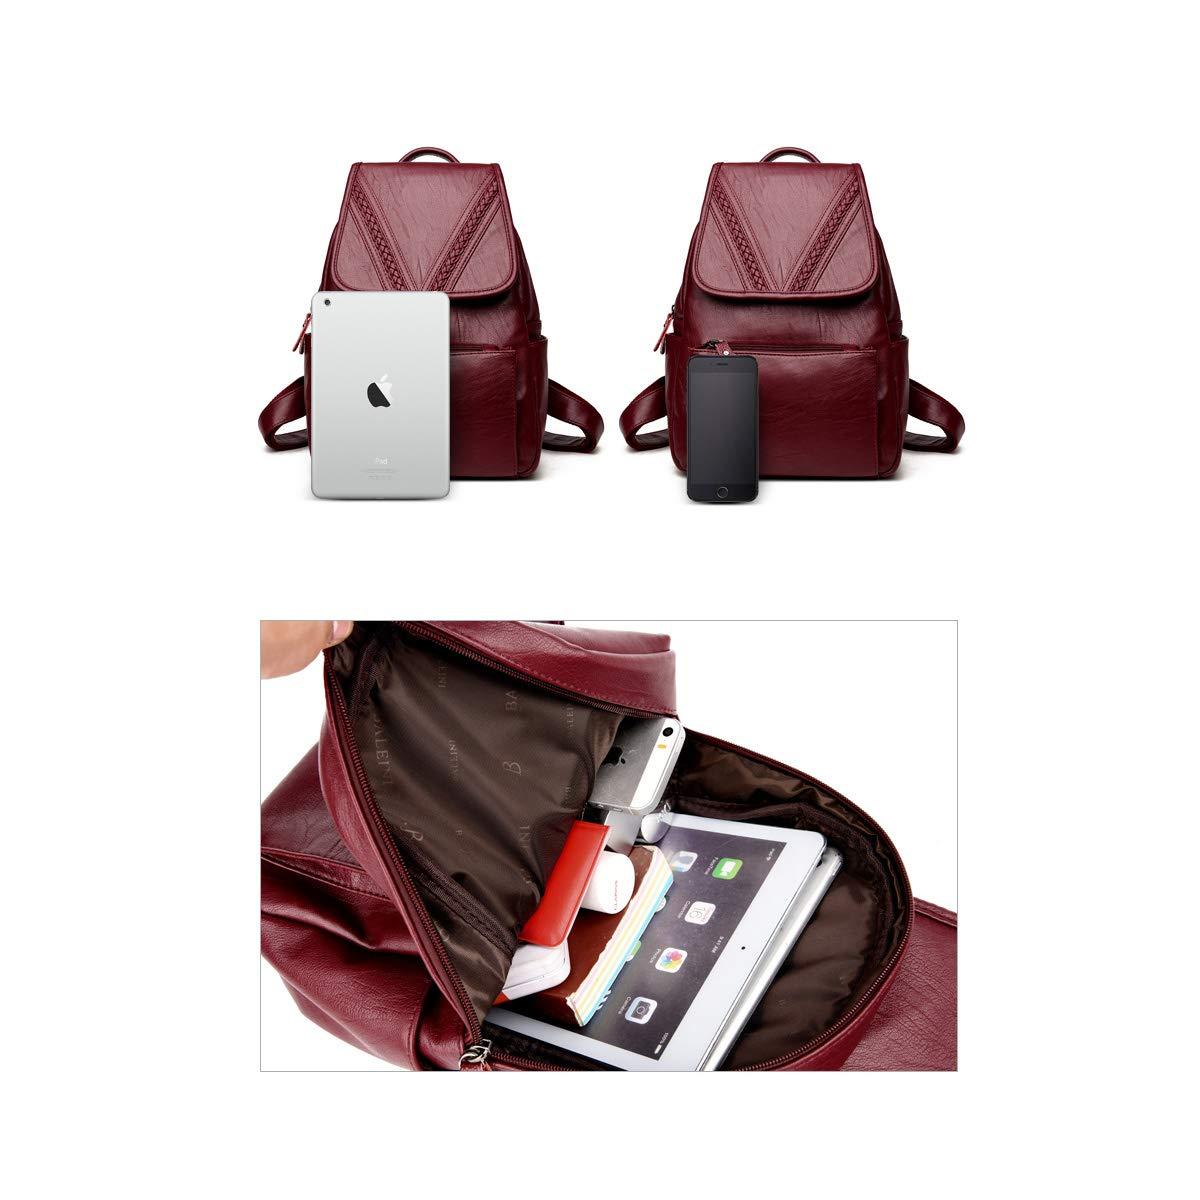 Haoyushangmao Girls Multifunctional Backpack for Daily Travel//Outdoor//Travel//School//Work//Fashion//Leisure PU Leather Sleek Minimalist. Black//Blue//Red//Bronze